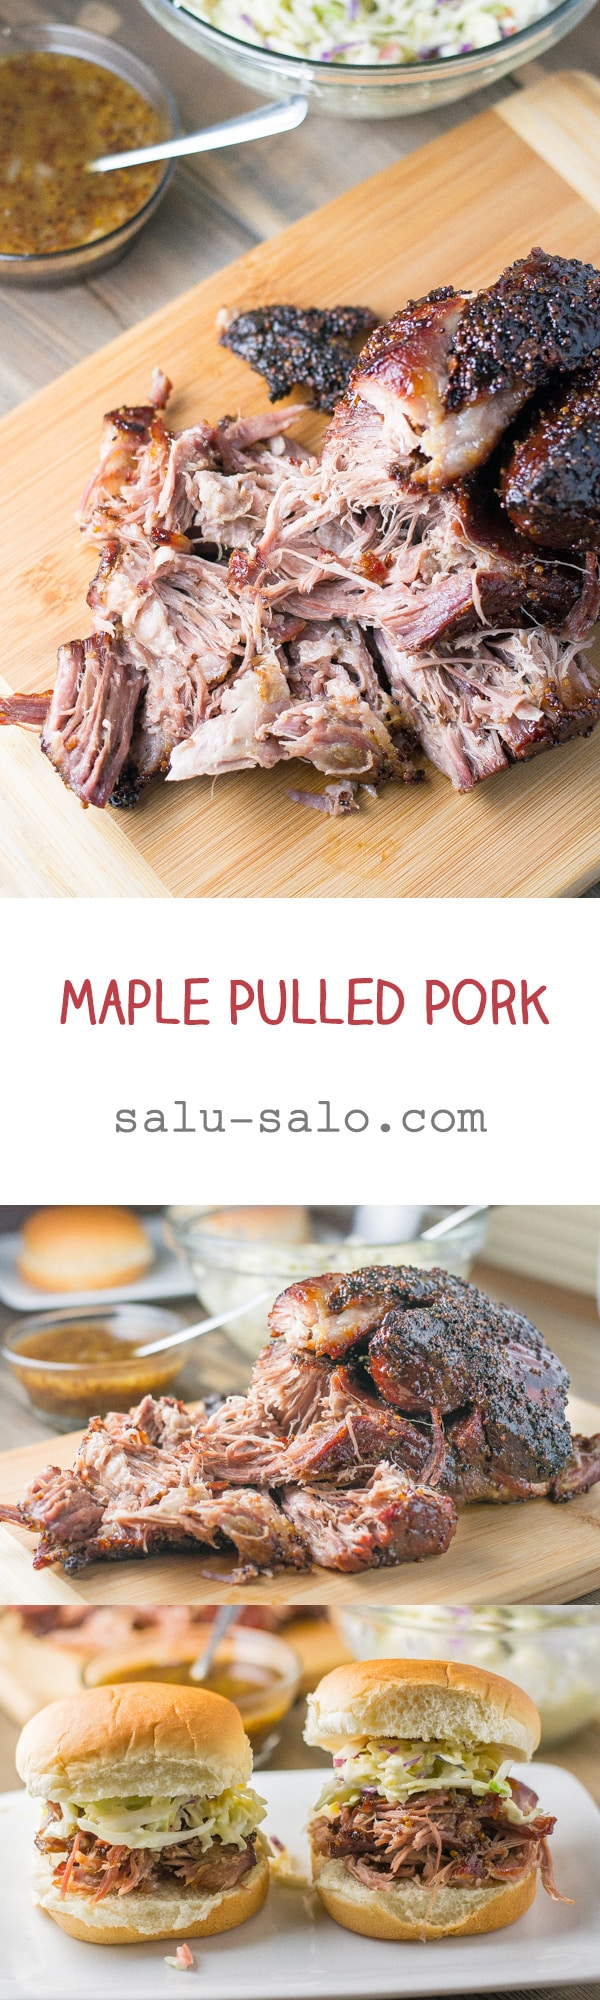 Maple Pulled Pork